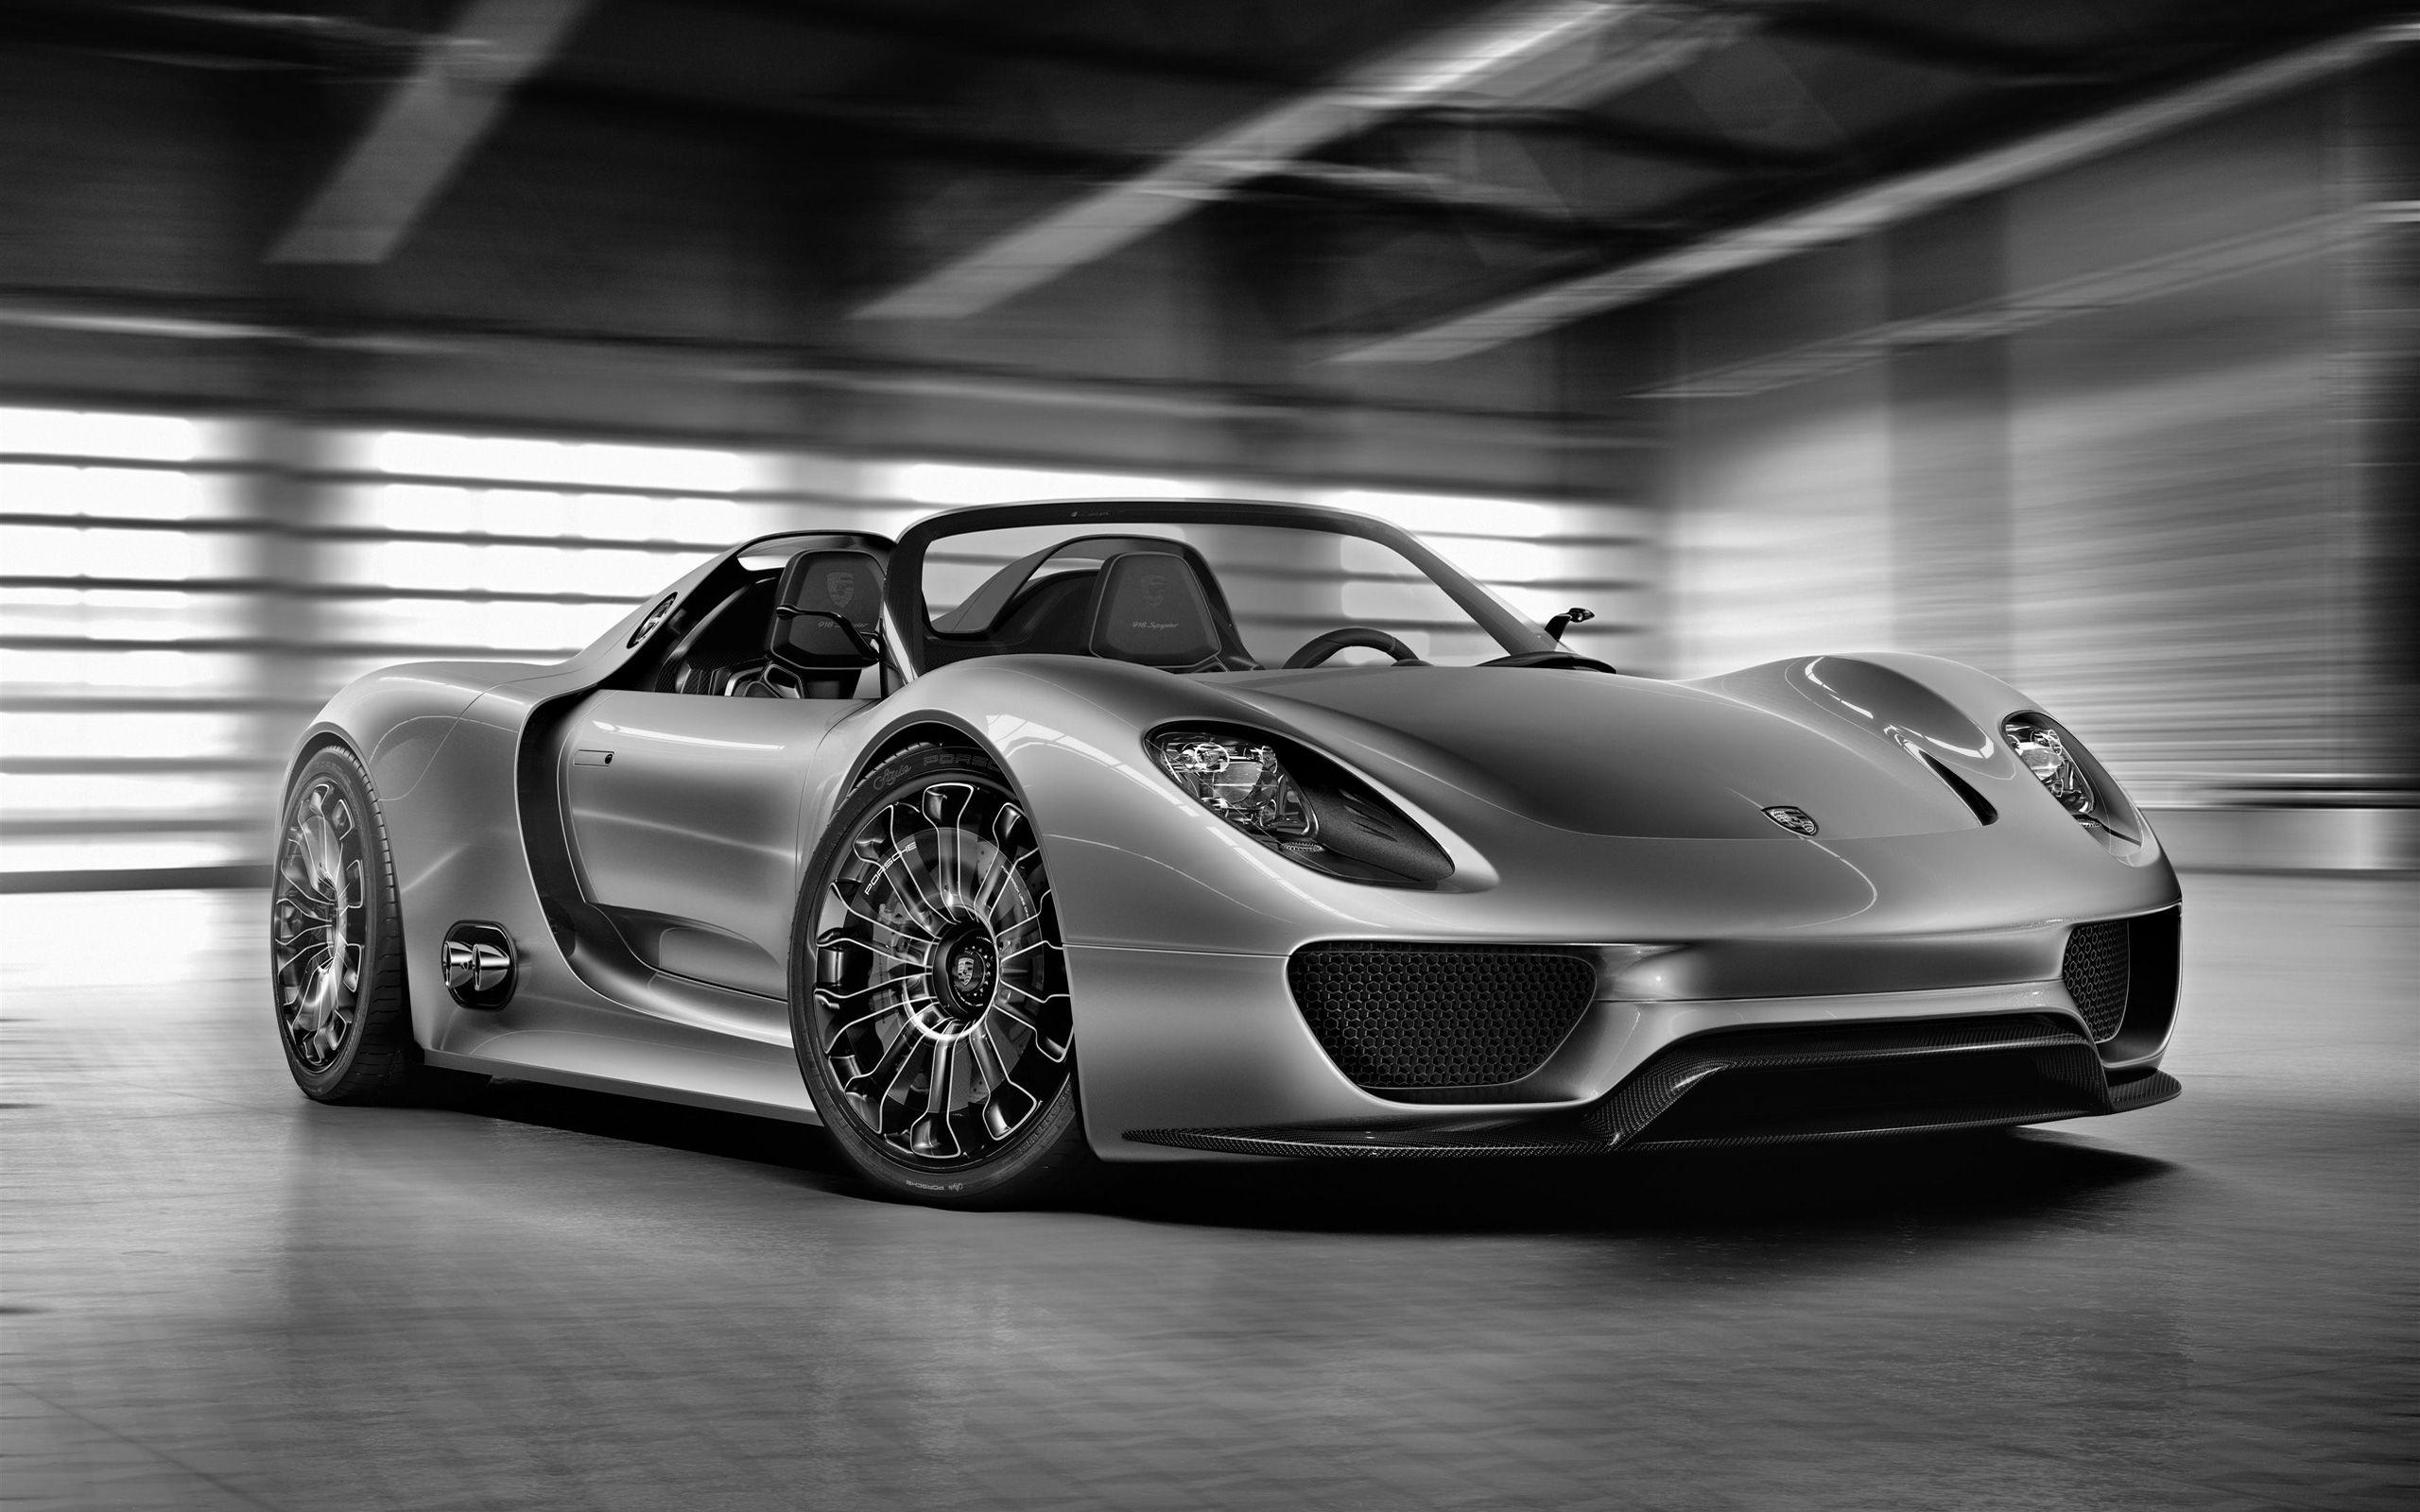 26420f1ef5f81607a21ff74d958c46a3 Fabulous Need for Speed Most Wanted 2012 Porsche 918 Spyder Concept Location Cars Trend